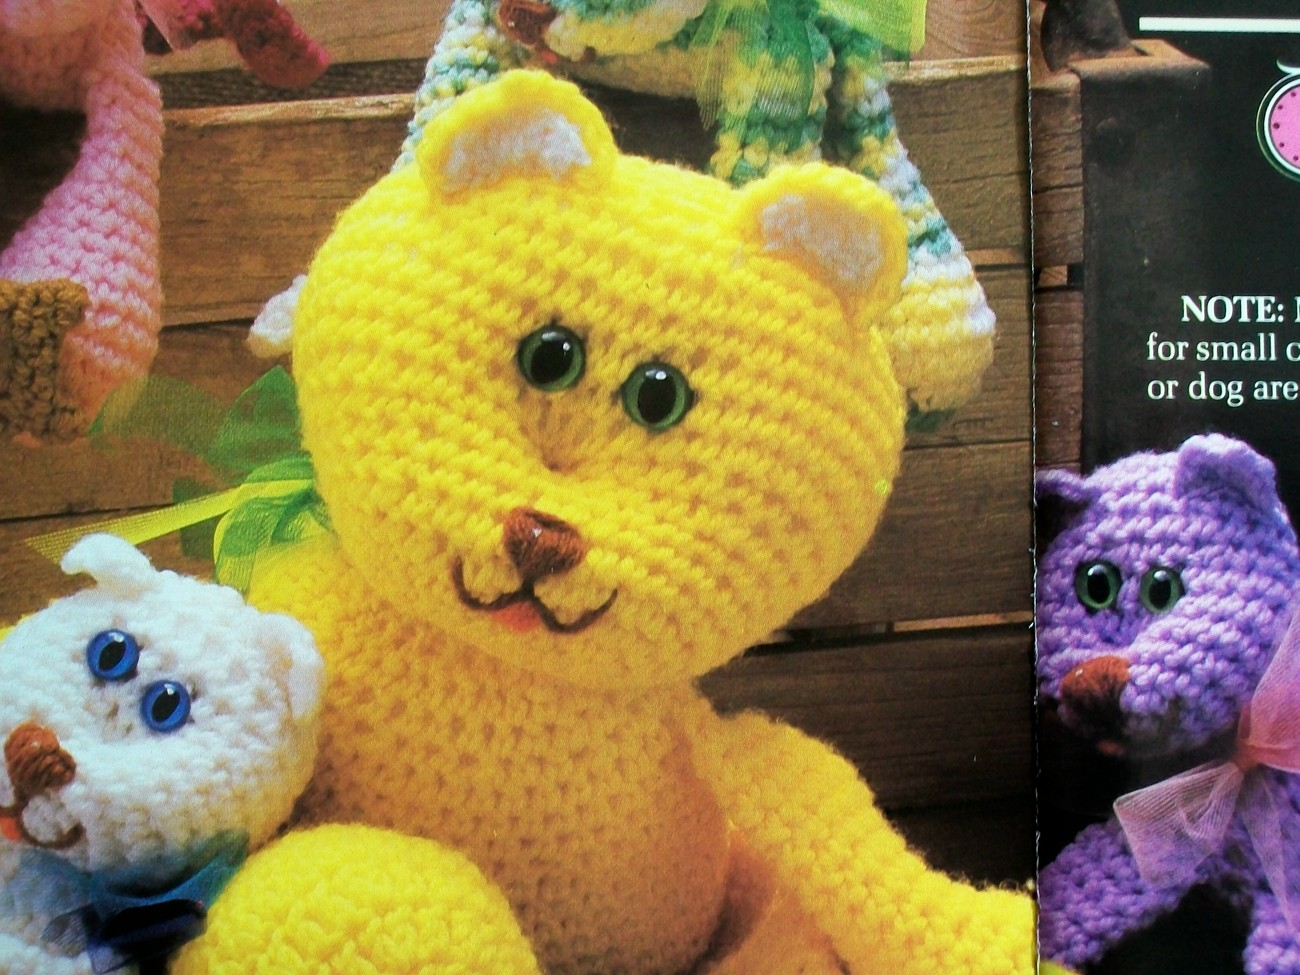 Amigurumi Dog Toy Patterns : Floppy Pets, Animal Cat & Dog Toy Doll, Amigurumi, Crochet ...